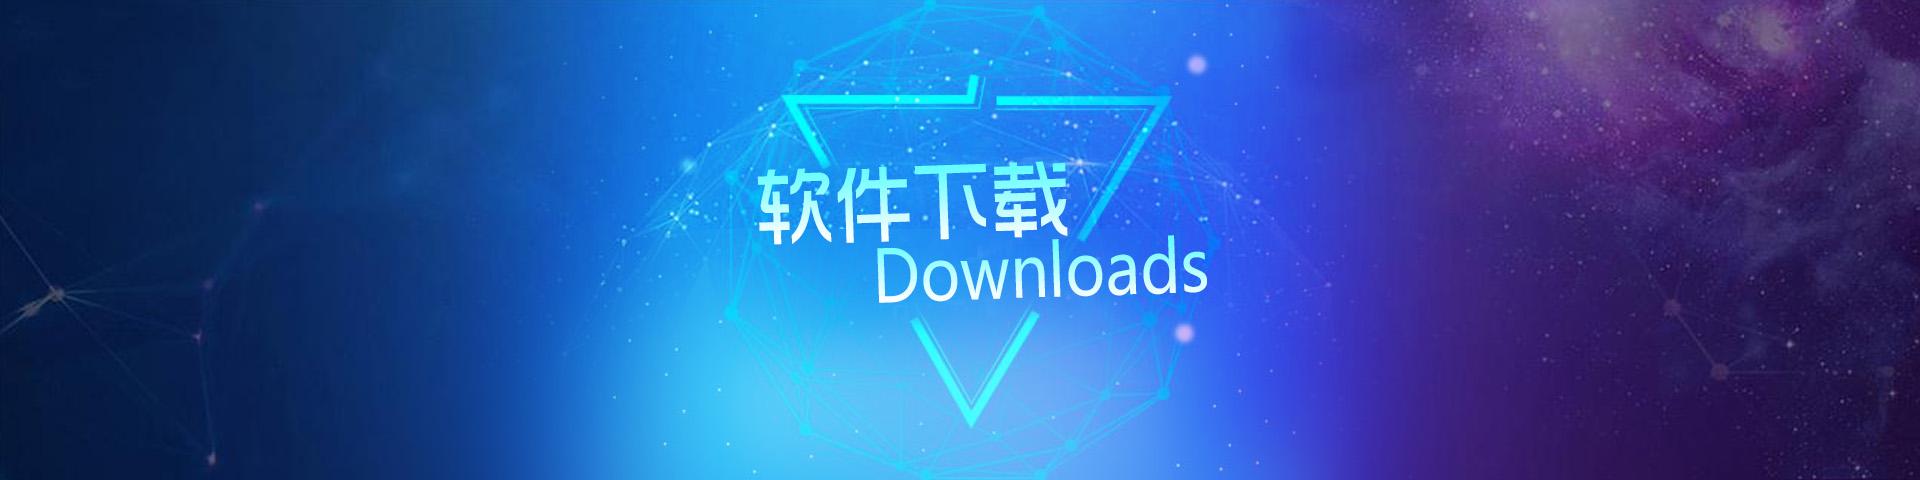 bn_downloads